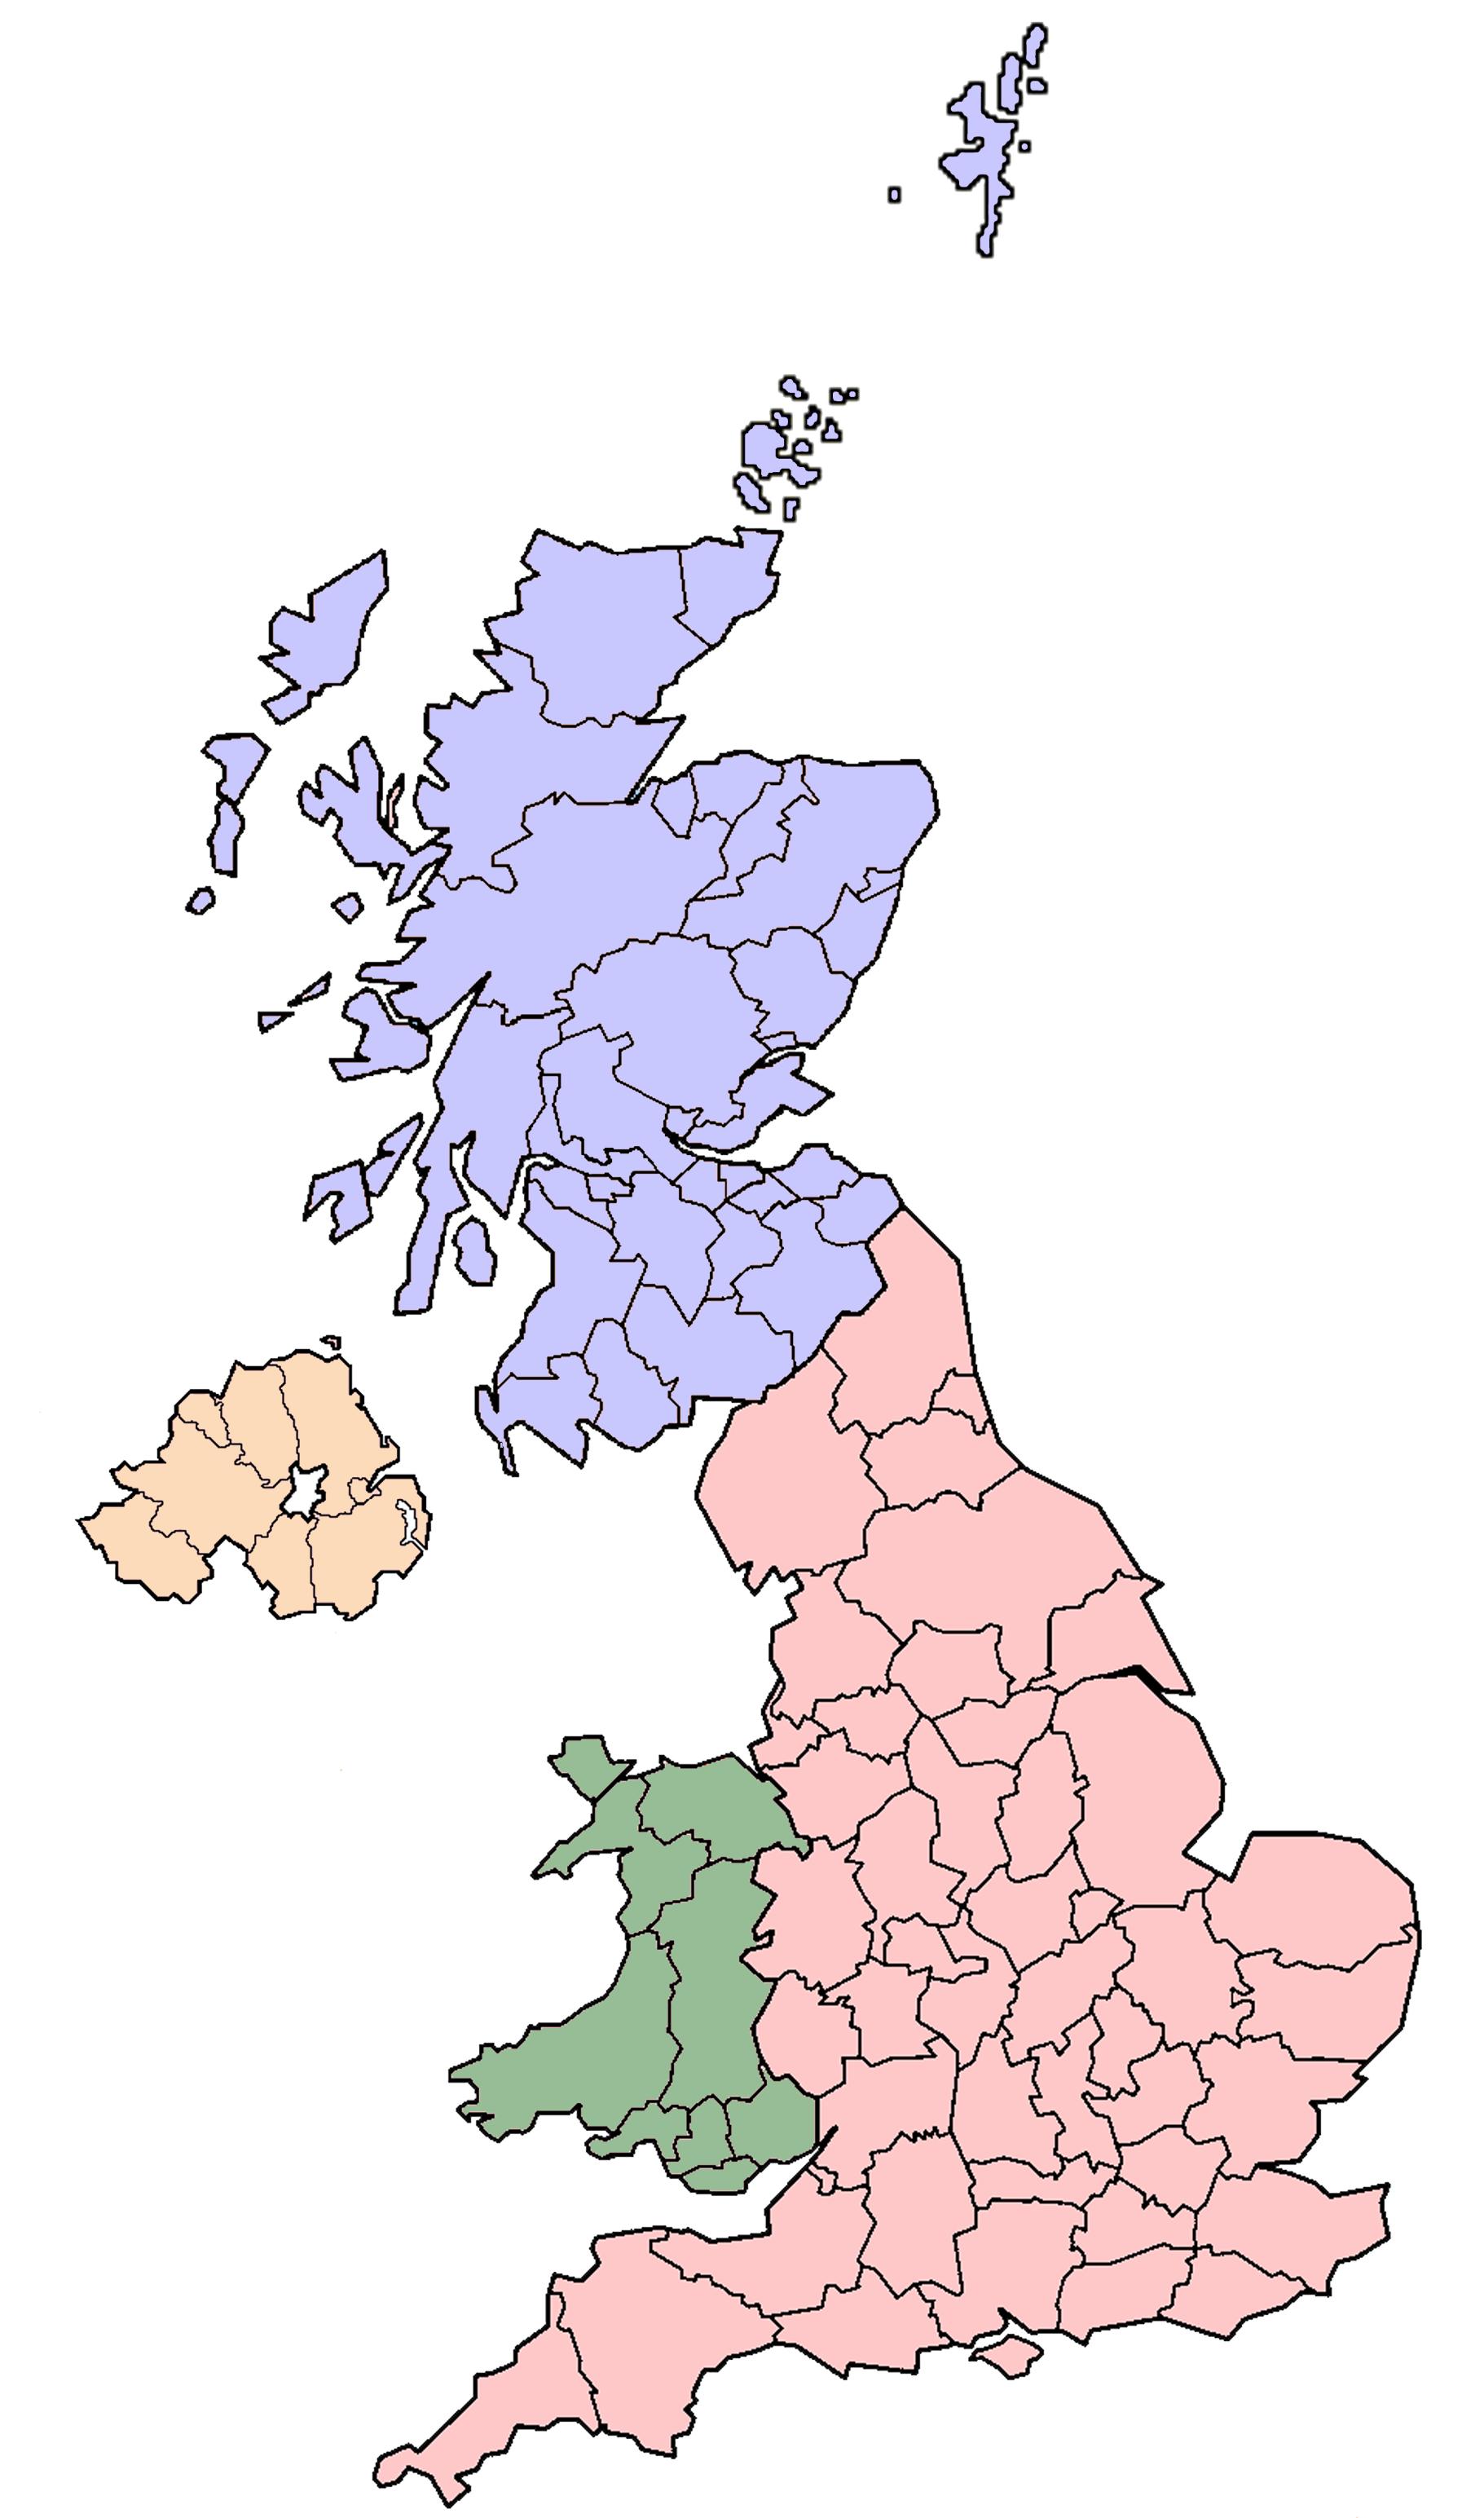 Resultado de imagen de MAP OF UK COUNTRIES WITHOUT NAMES